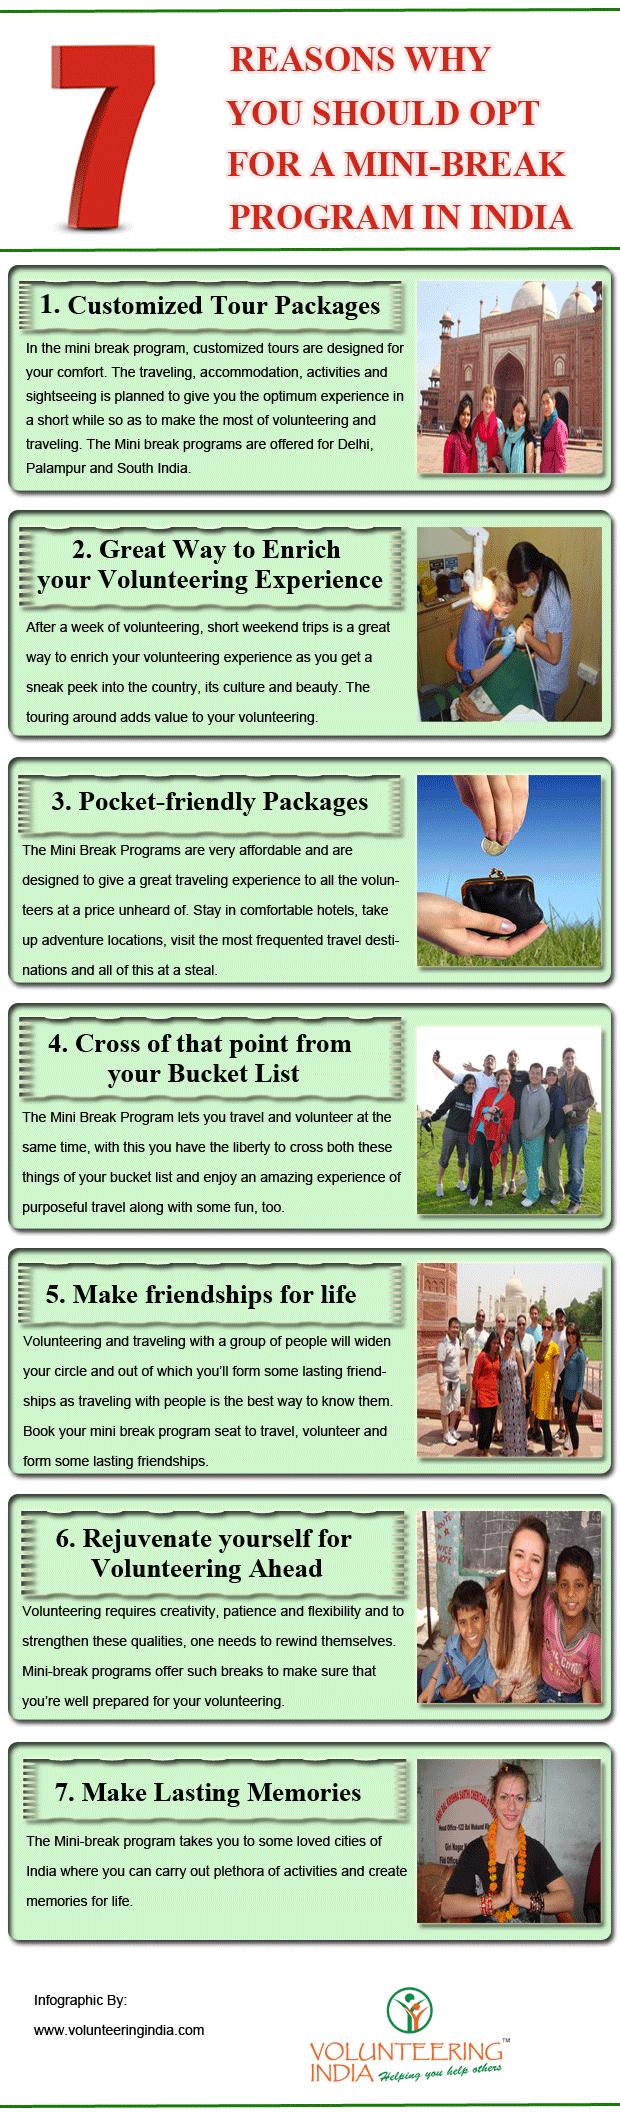 Mini break volunteer program in India   Infographic